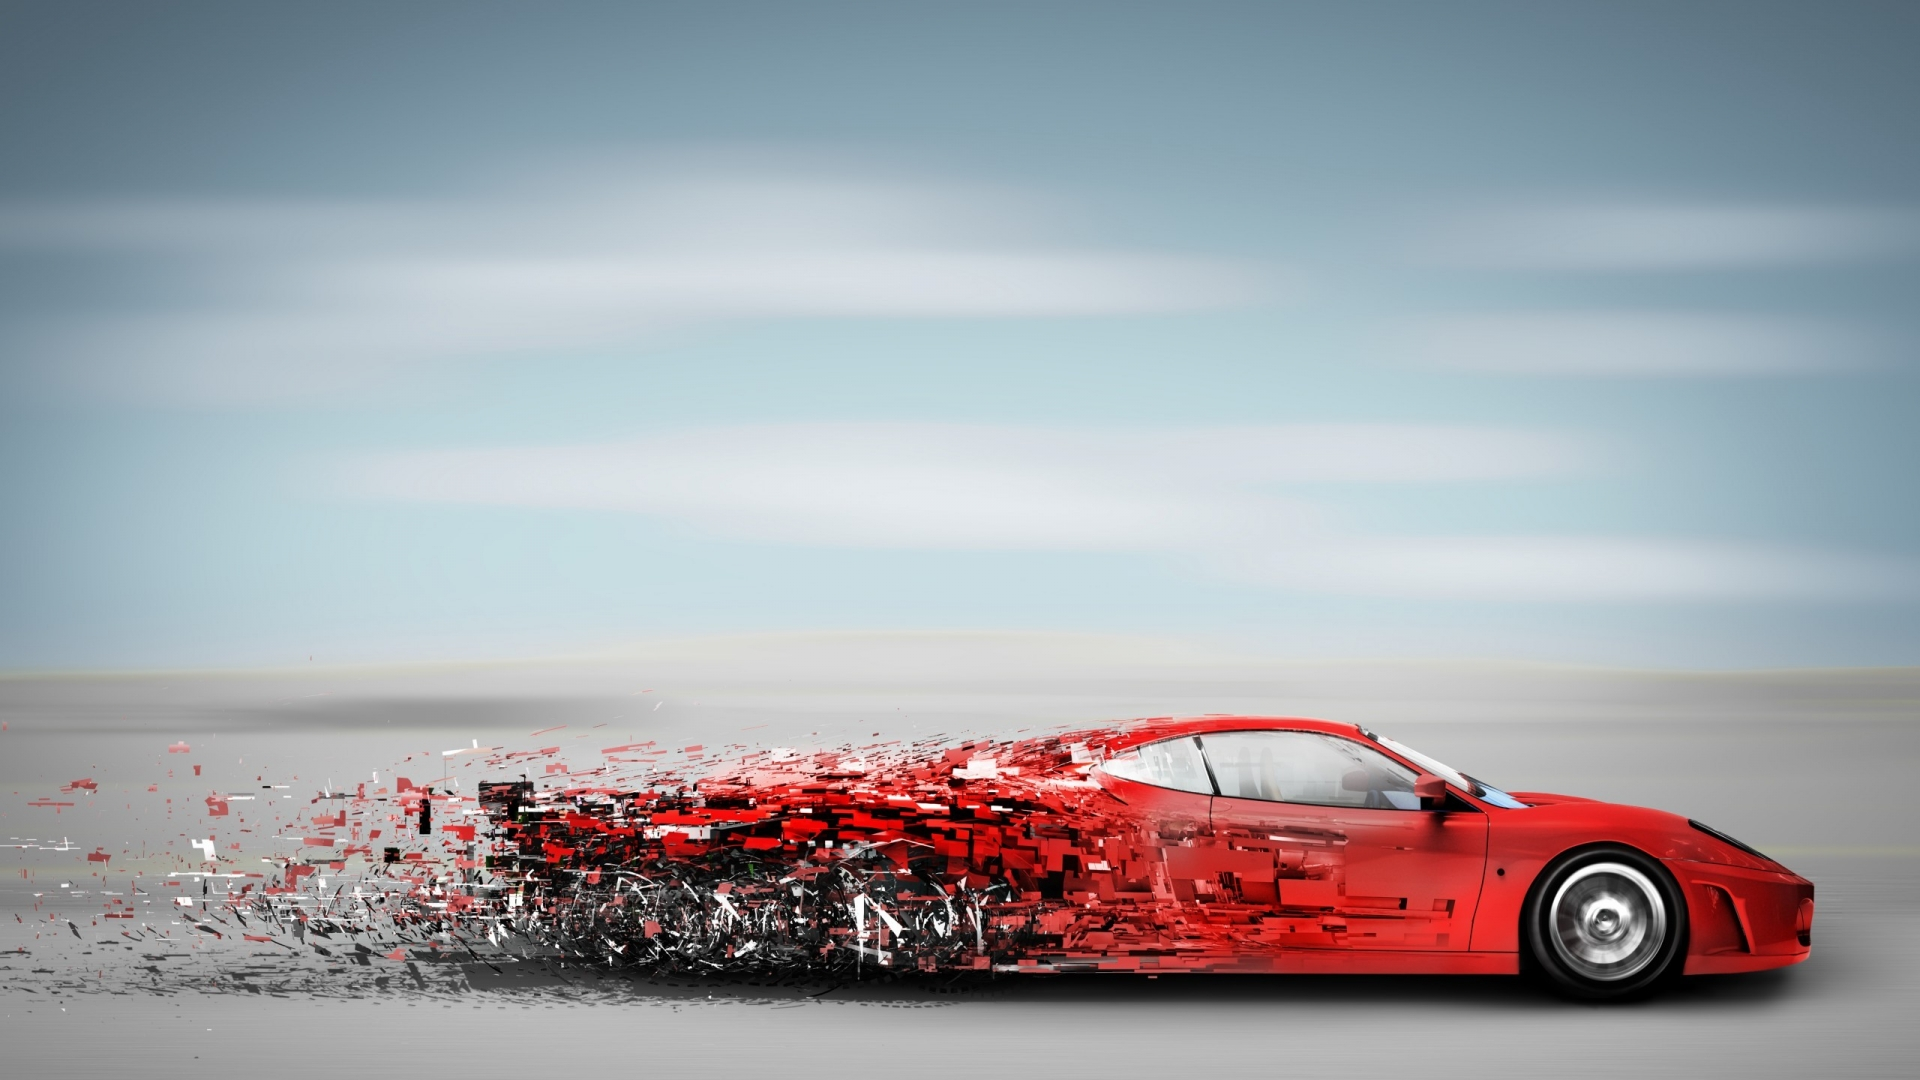 Abstract Red Speedy Car Sport Car Wallpaper Wallpaper